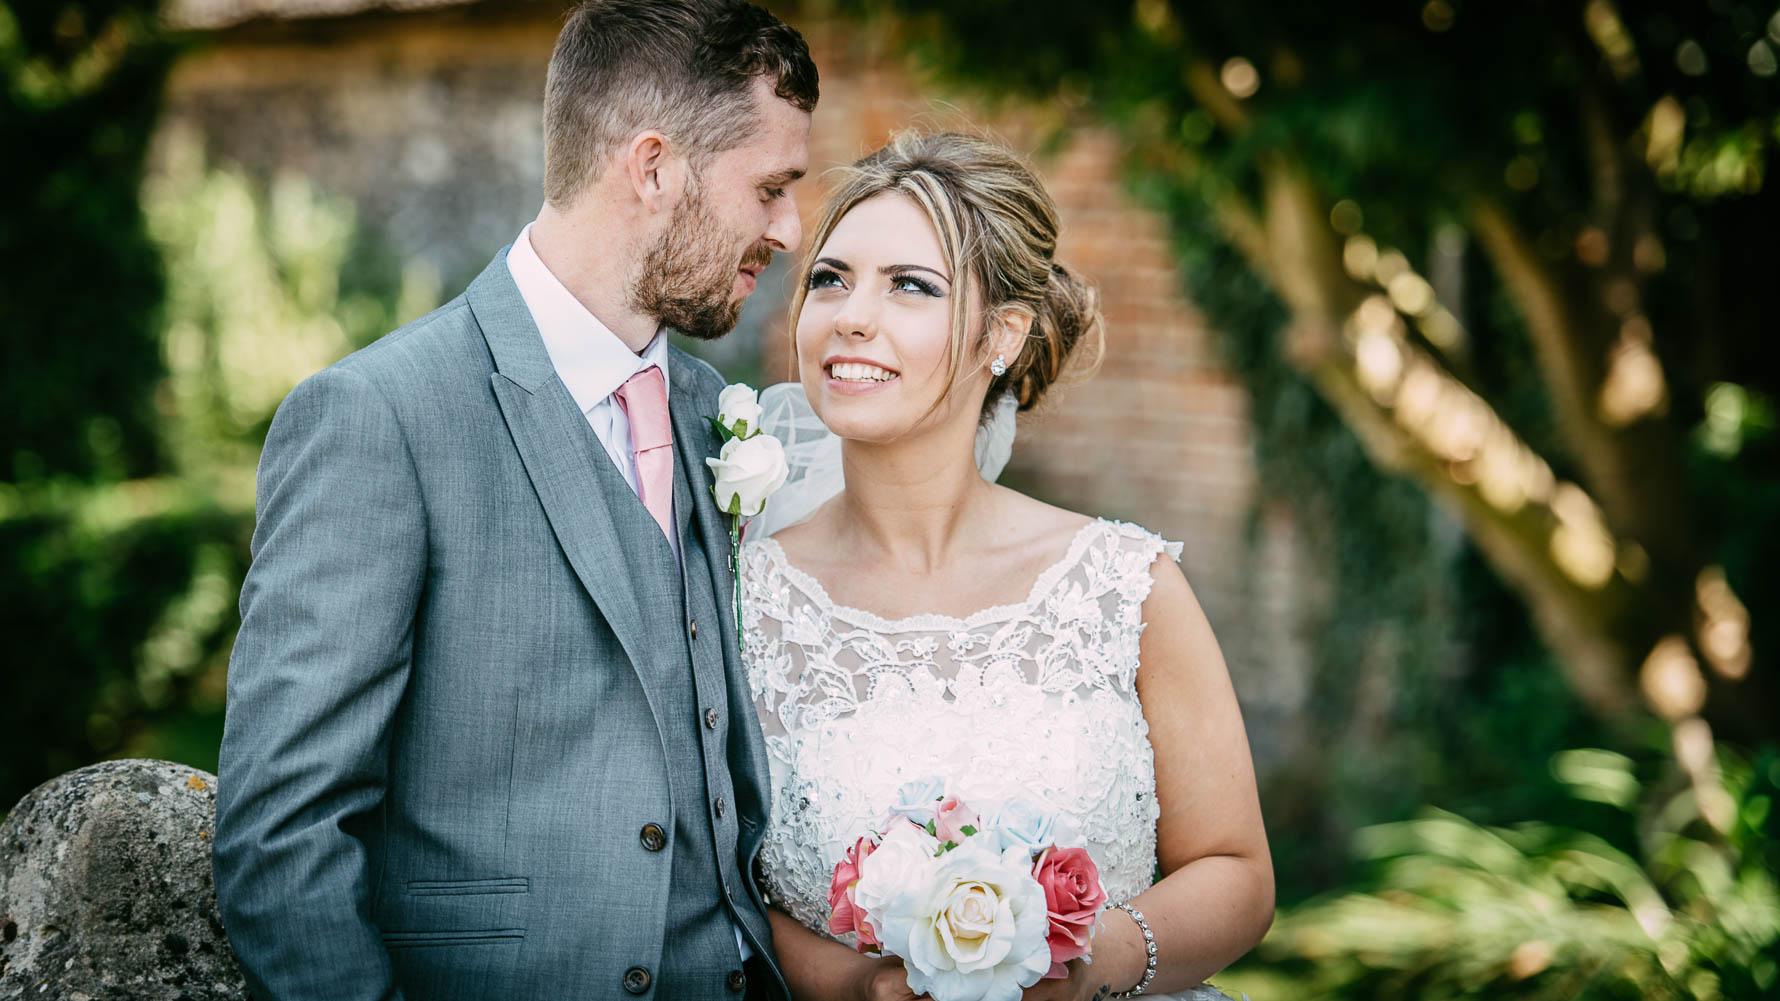 Wedding photography at Solton Manor-4.jpg